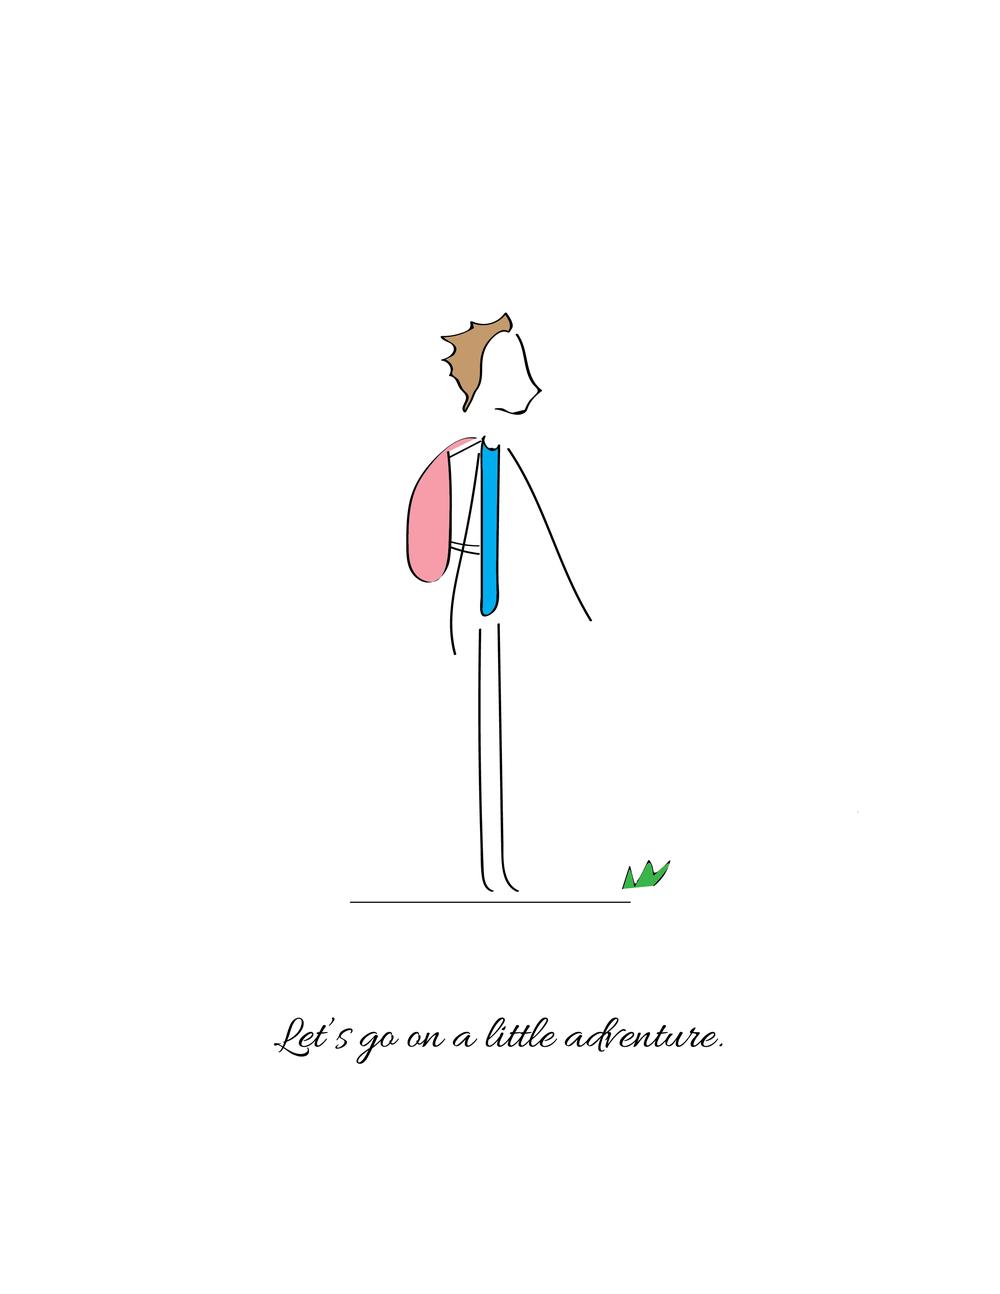 Adventure-01.png